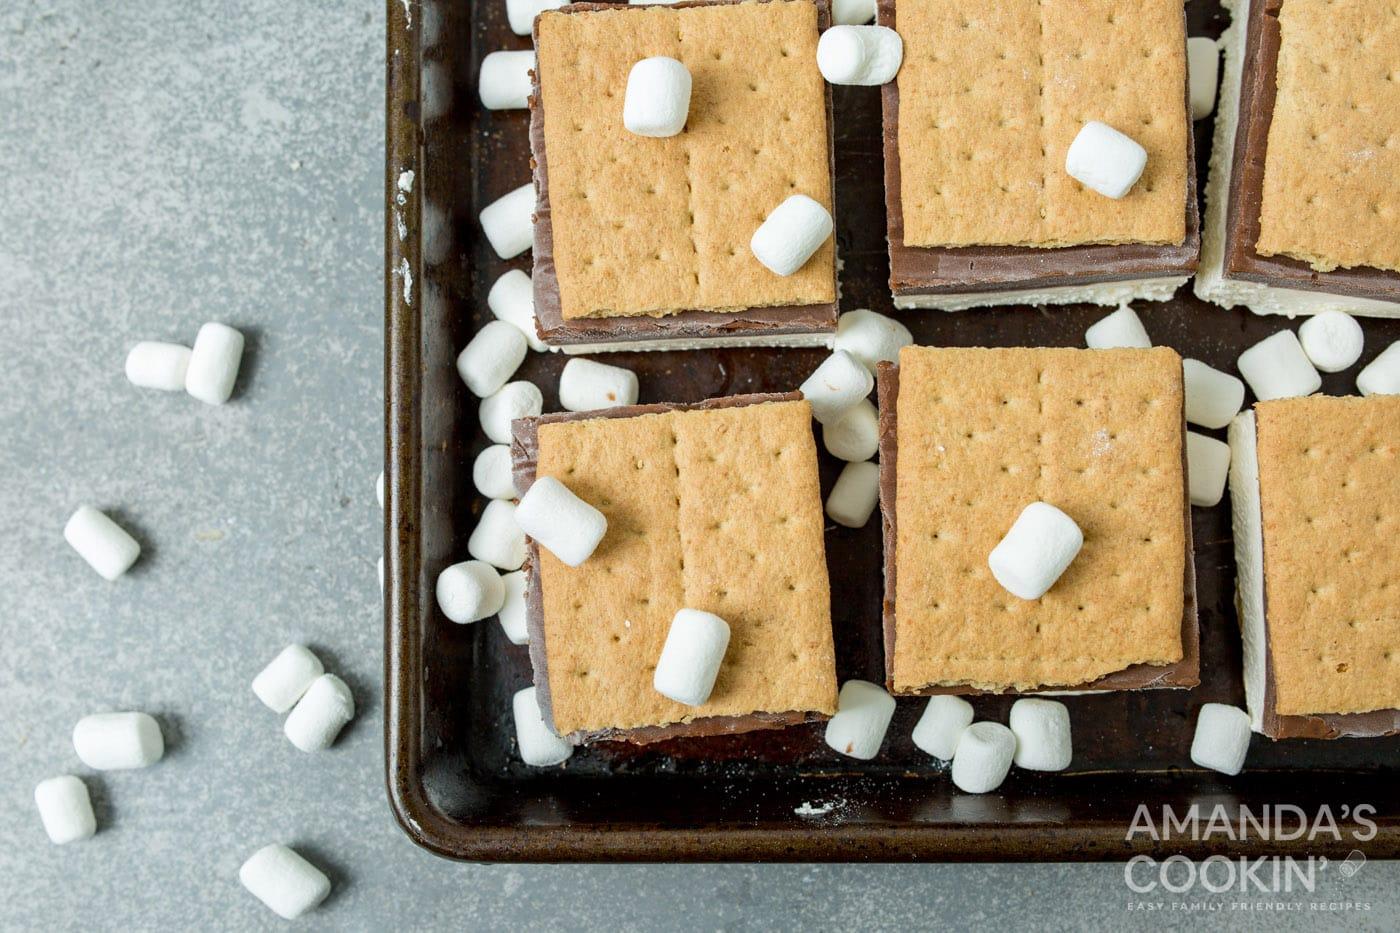 frozen smores with marshmallows